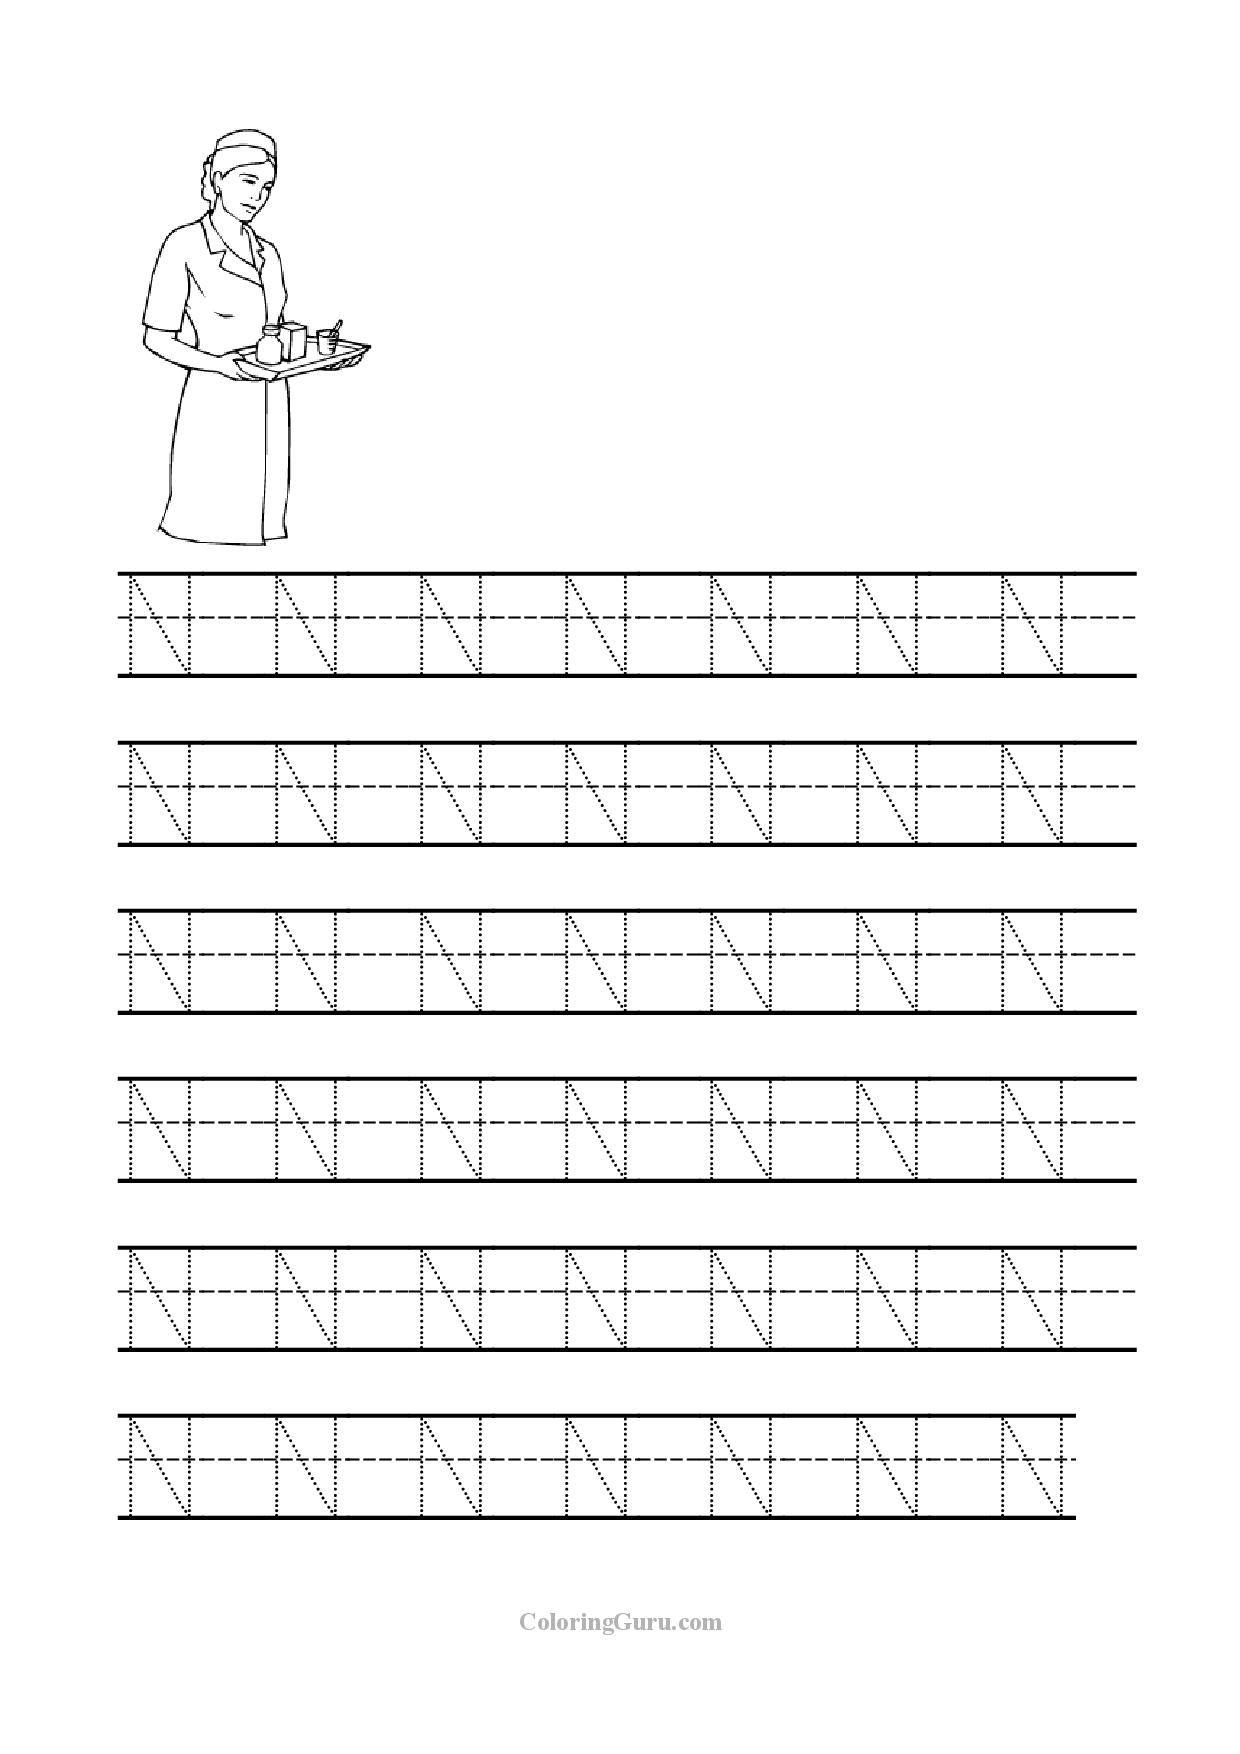 Tracing Letter N Worksheets